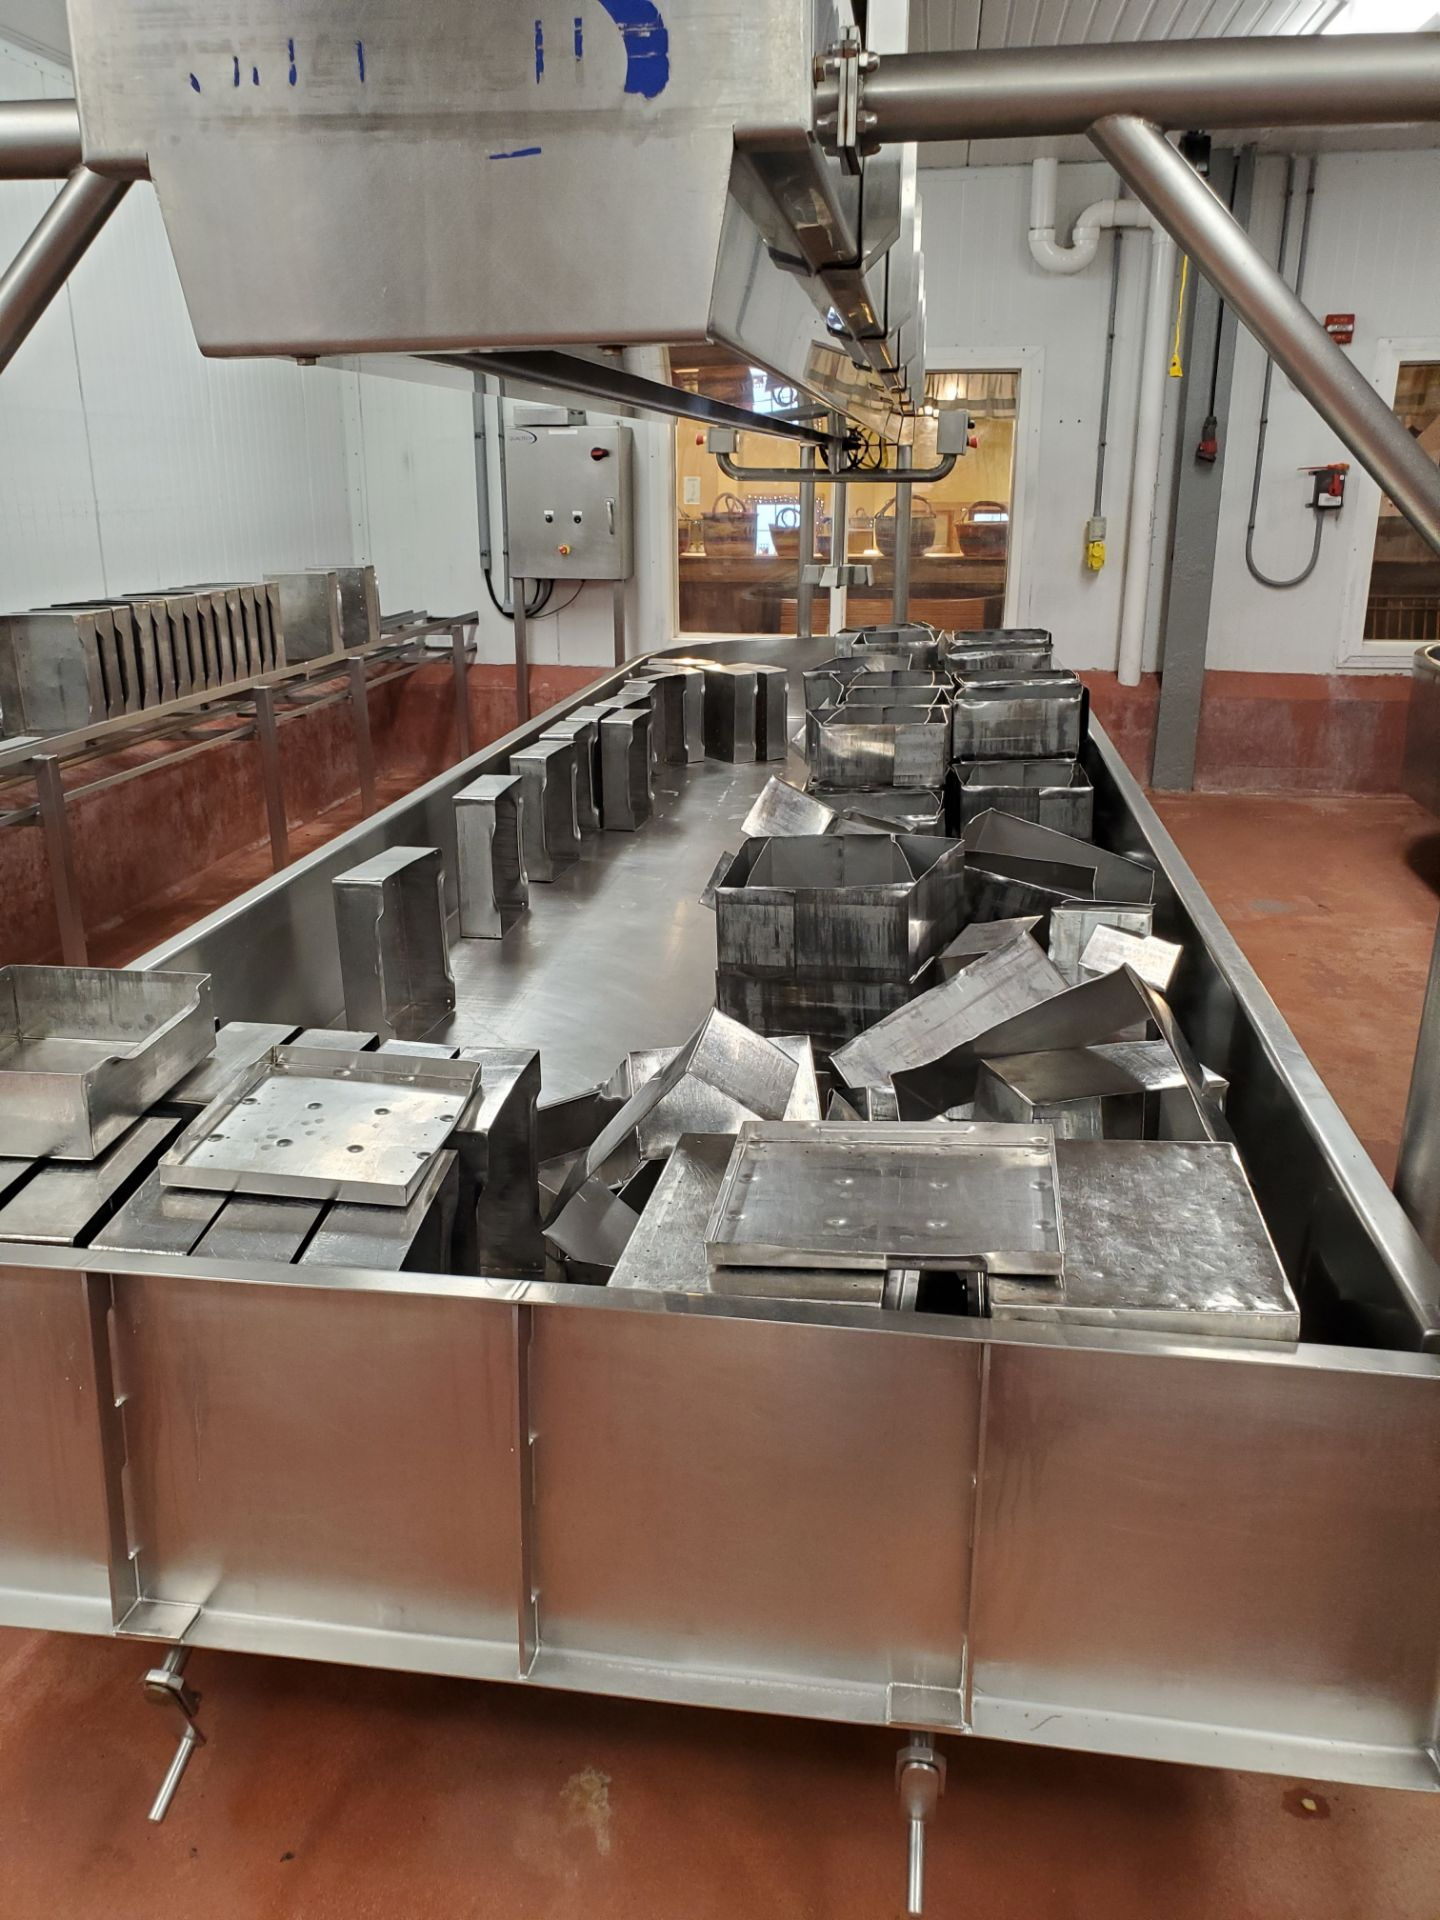 2008 Qualtech 2,000 LB Capacity S/S Cheese Finishing Vat (Finishing Vat # 2)